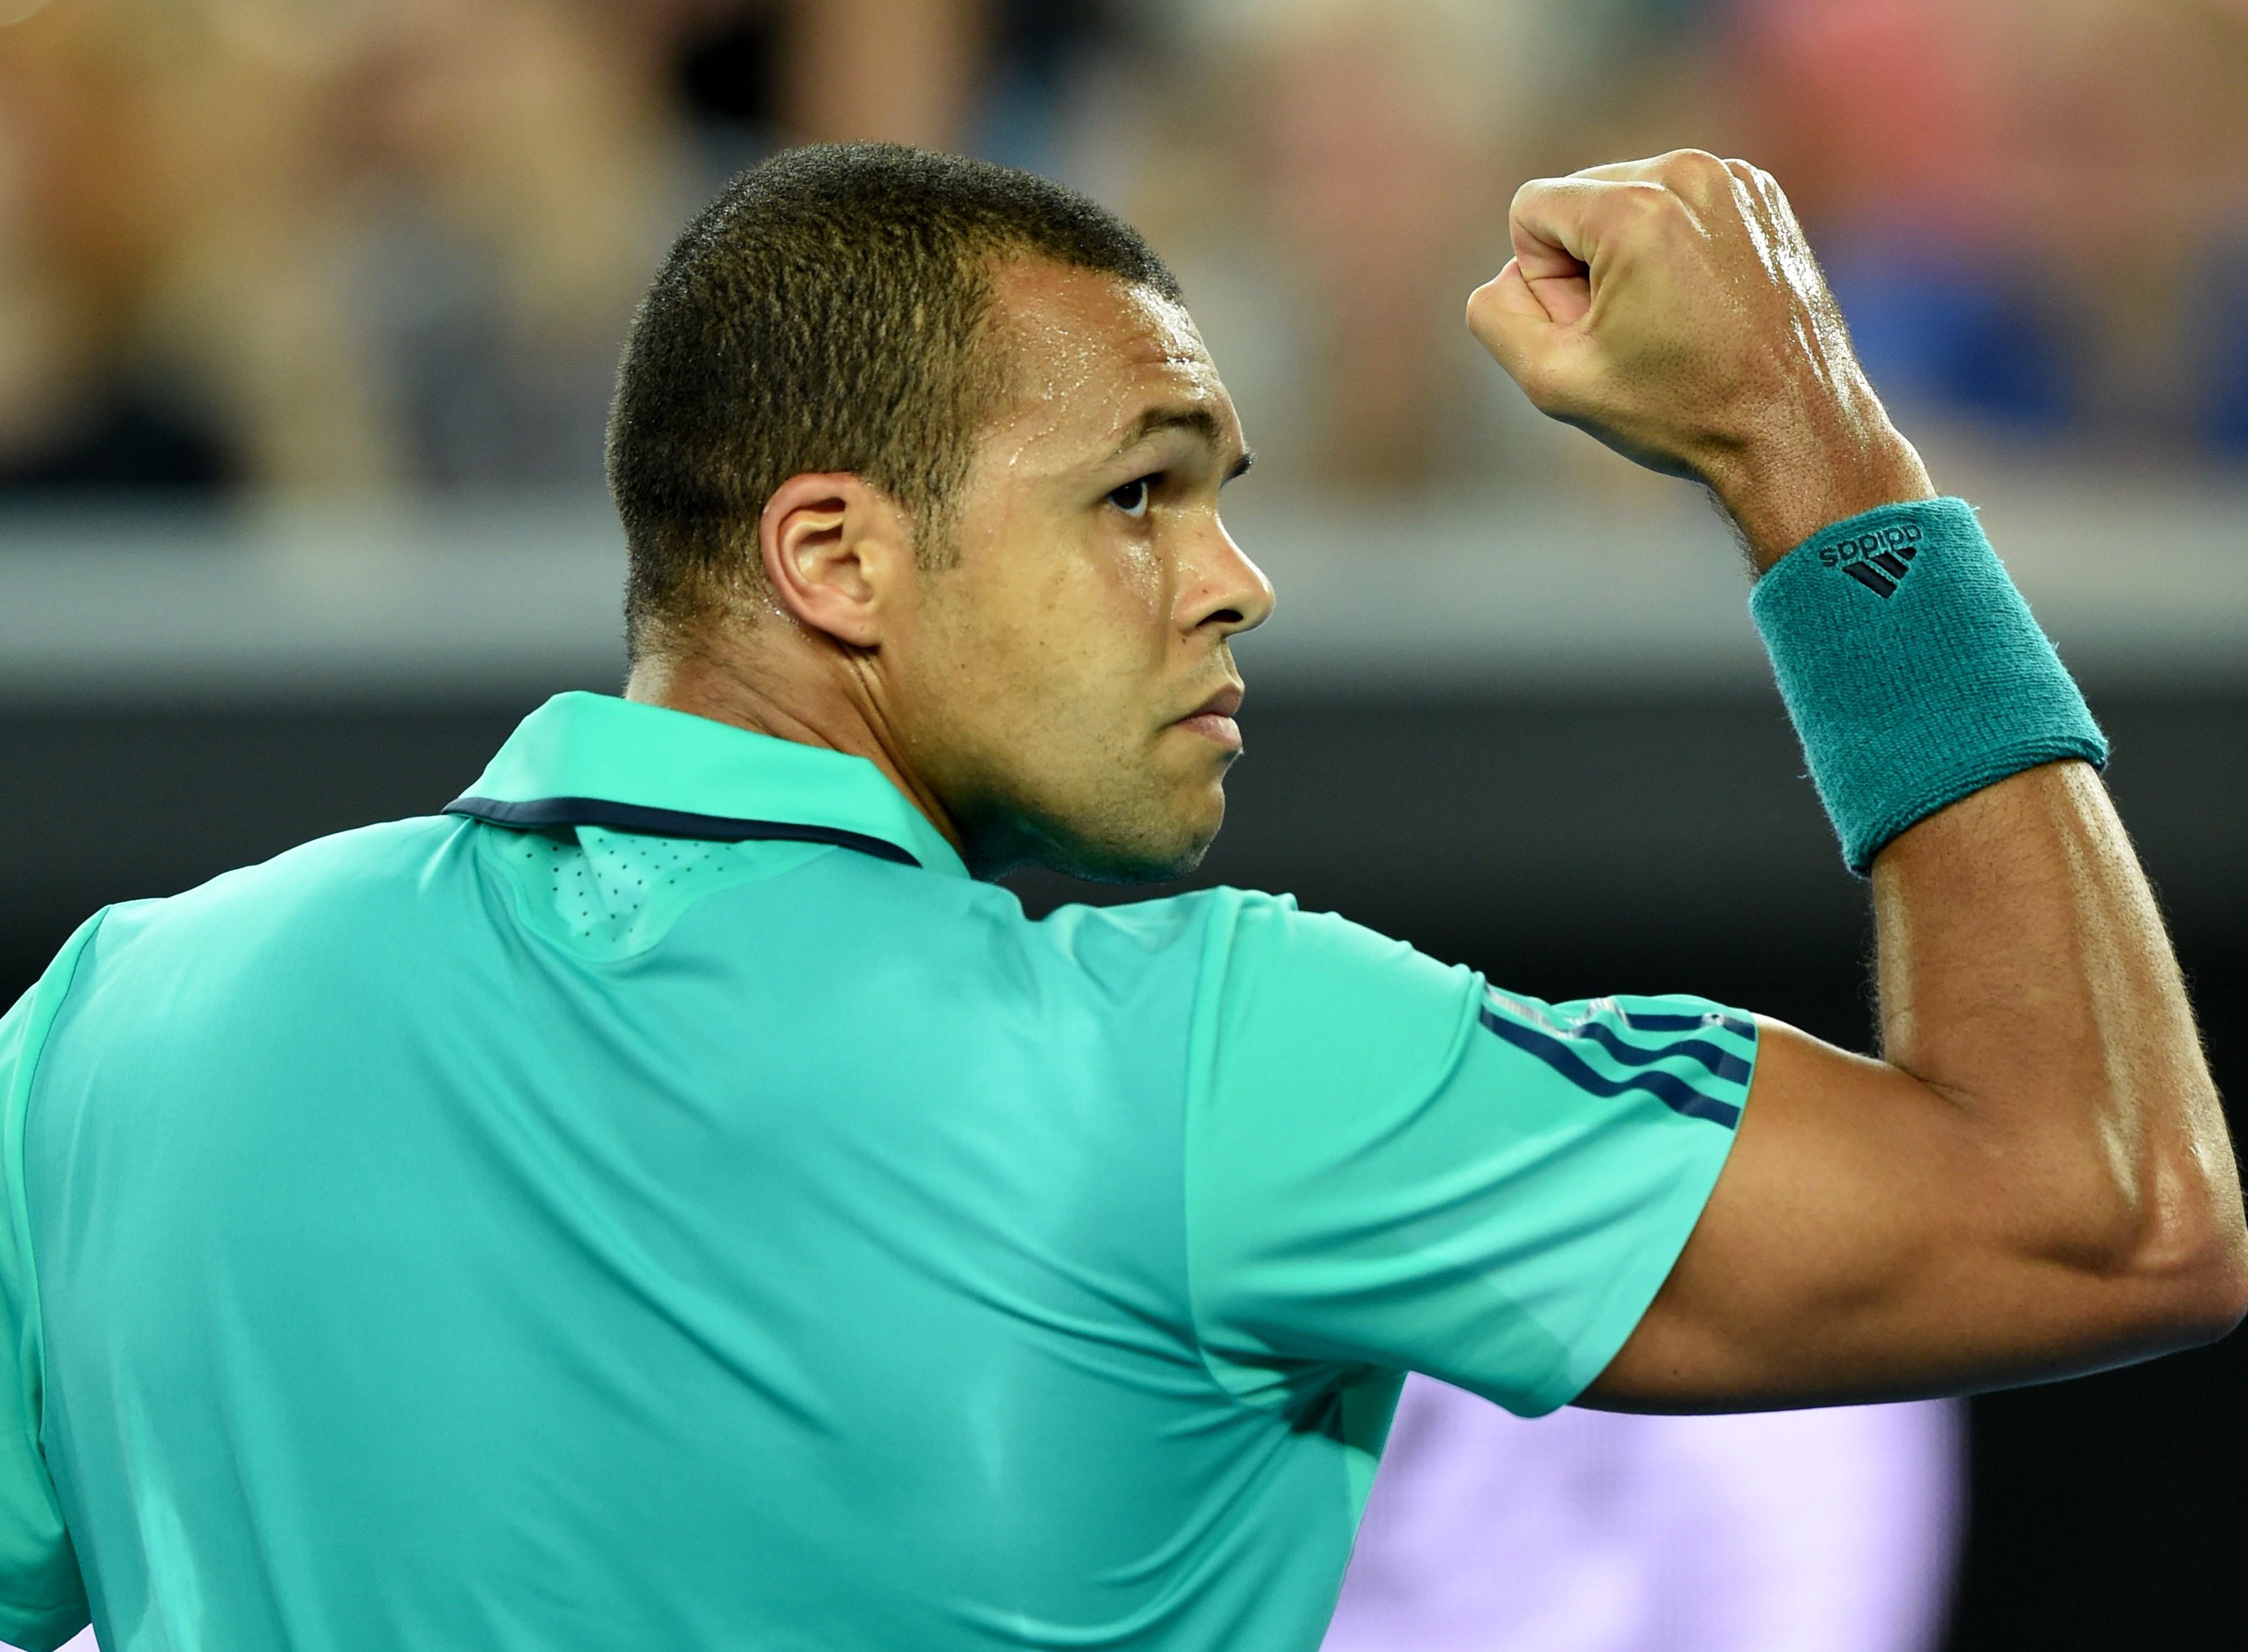 Tennis - Open Australie - Tsonga et Simon rassurent, Benneteau et Mathieu K.O